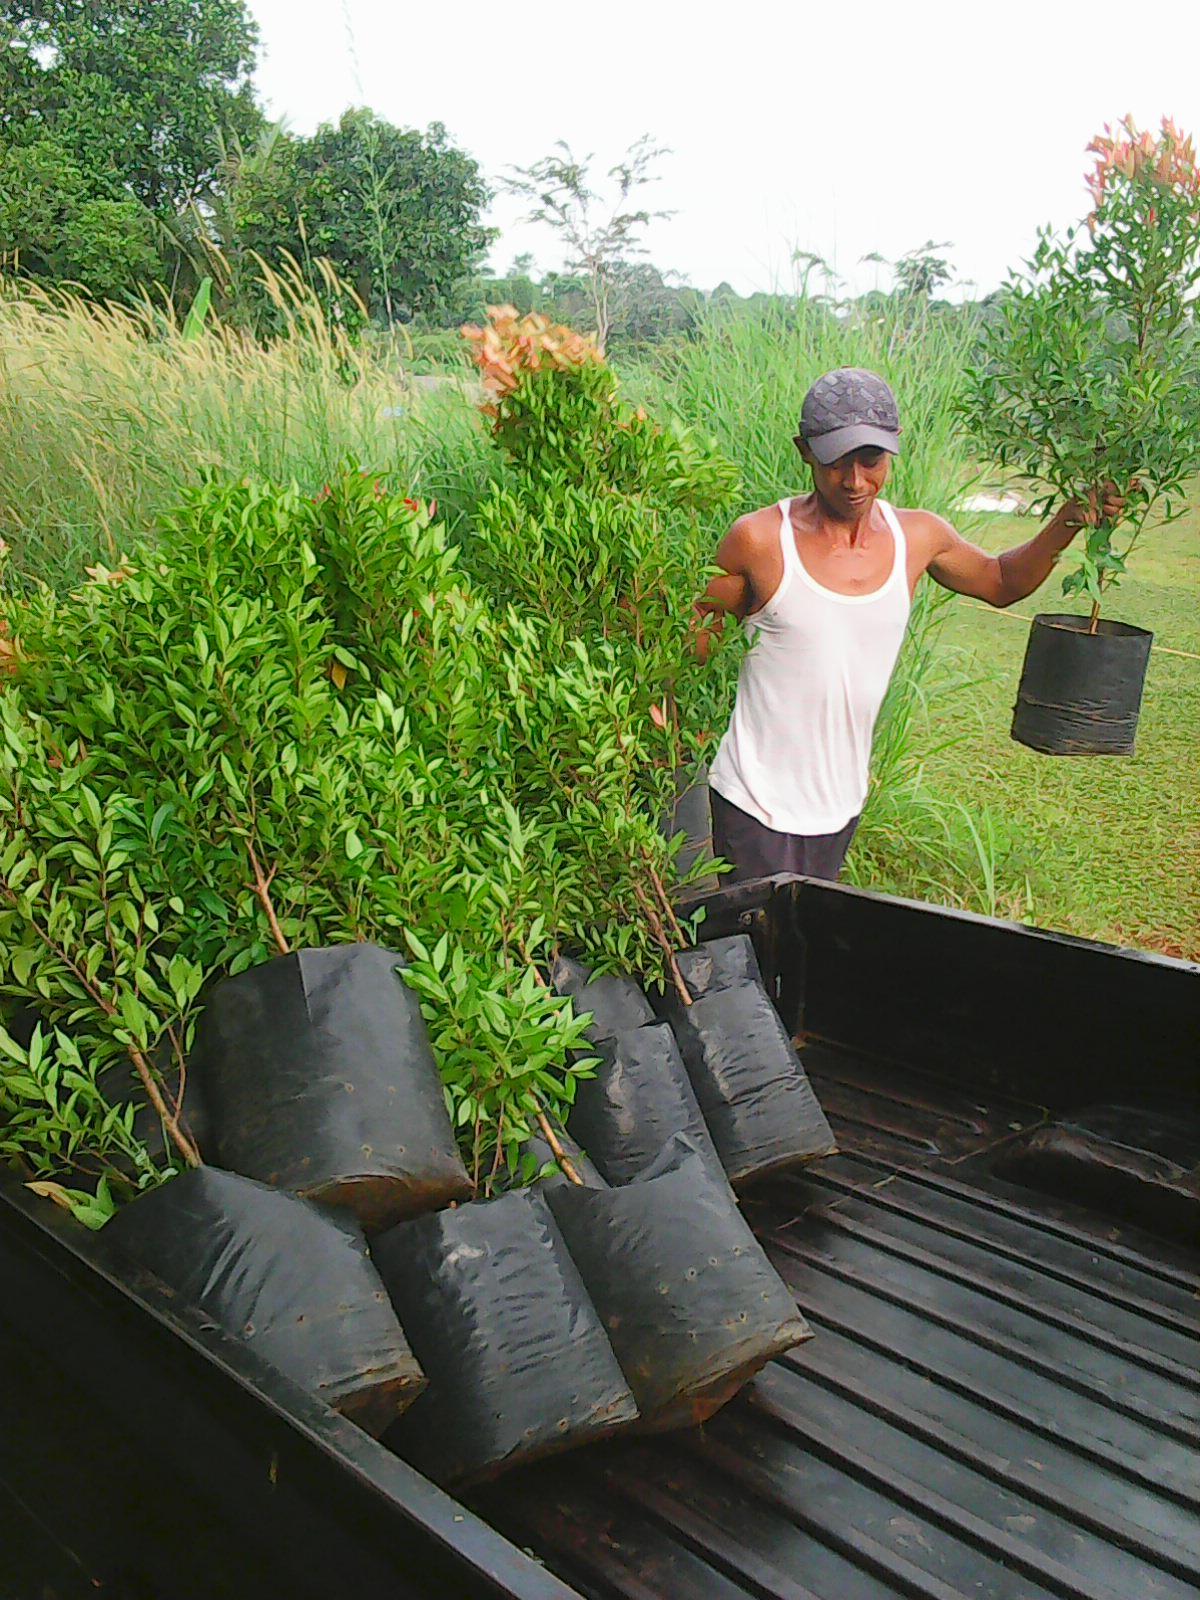 Tanaman Hias Pohon Jasa Tanam Pucuk Merah Biji Rumput Pasang Taman Petani Gajah Mini Golf Jepang Swis Benih Bermuda Grass Kolam Koi Ikan